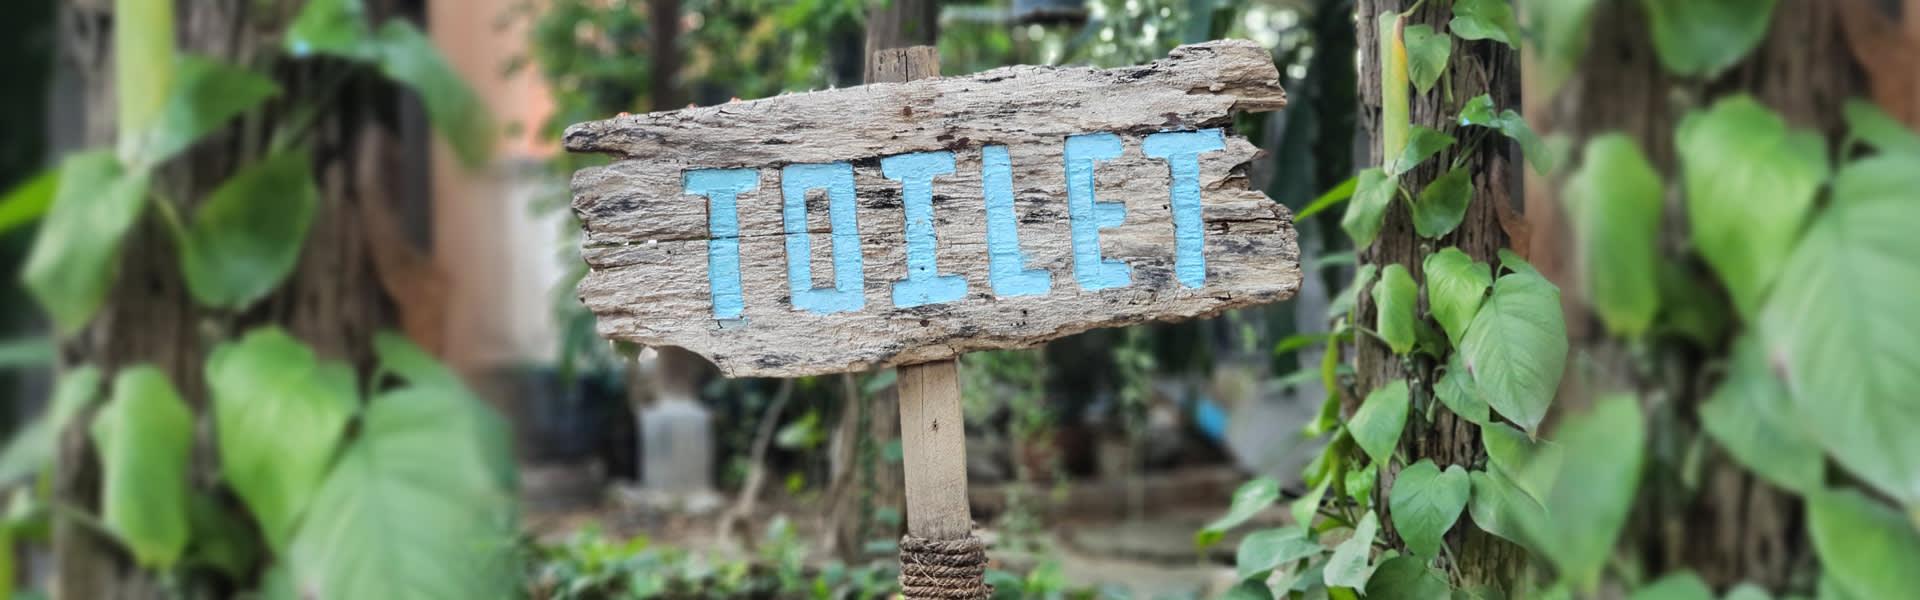 toilet-slim